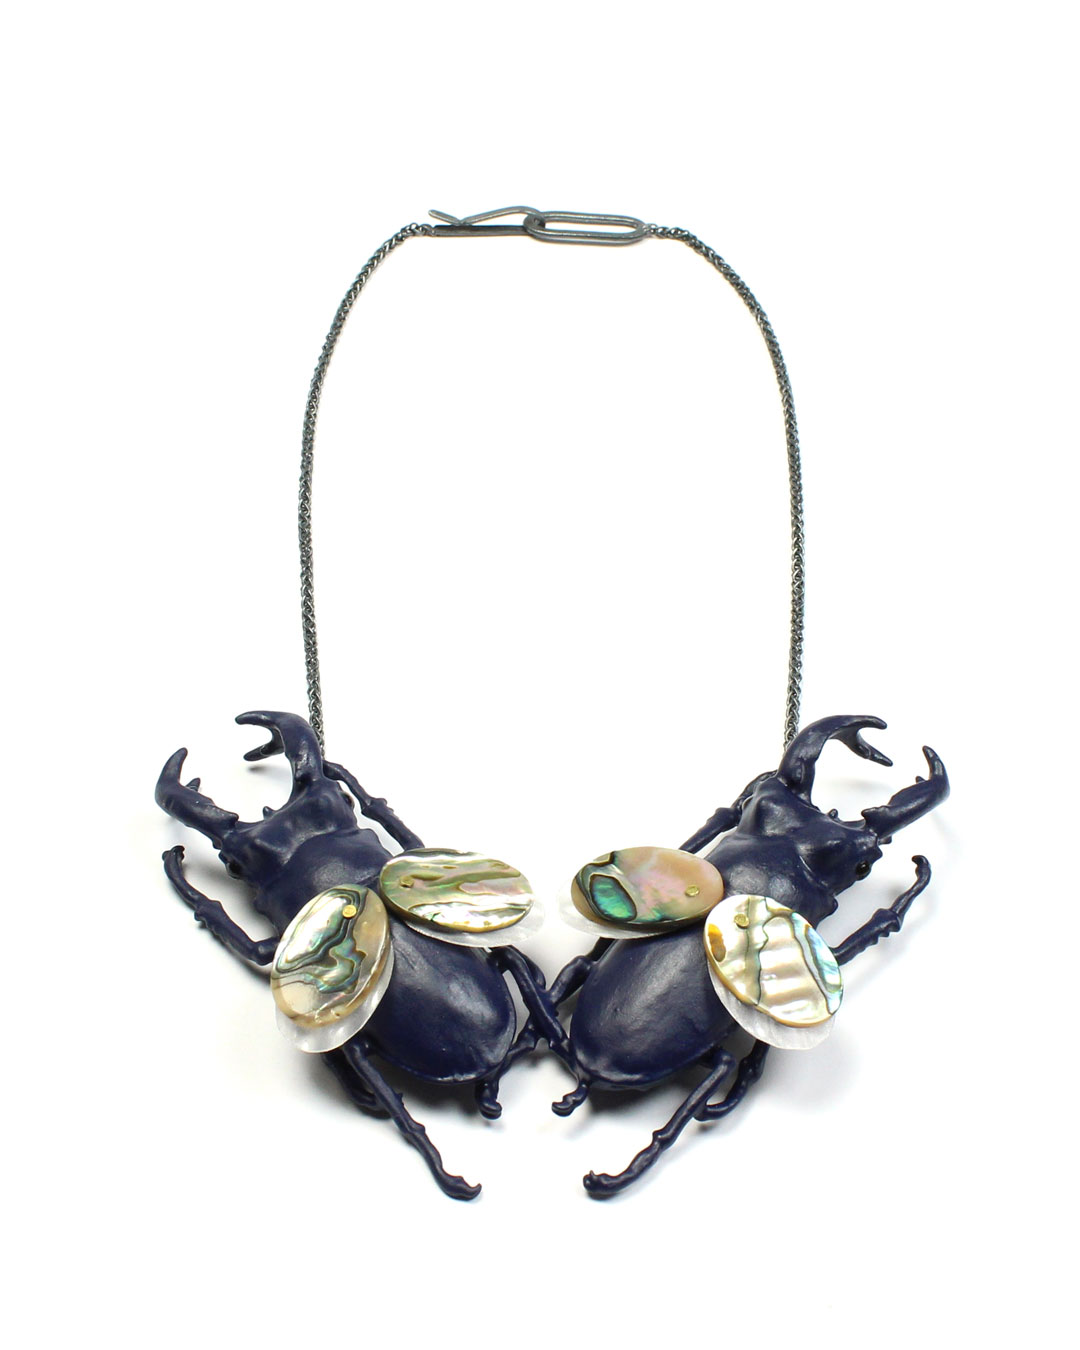 Märta Mattsson, Mermen, 2019, necklace; beetles, copper, lacquer, resin, shells, plastic, silver, 140 x 250 x 30 mm, €3050